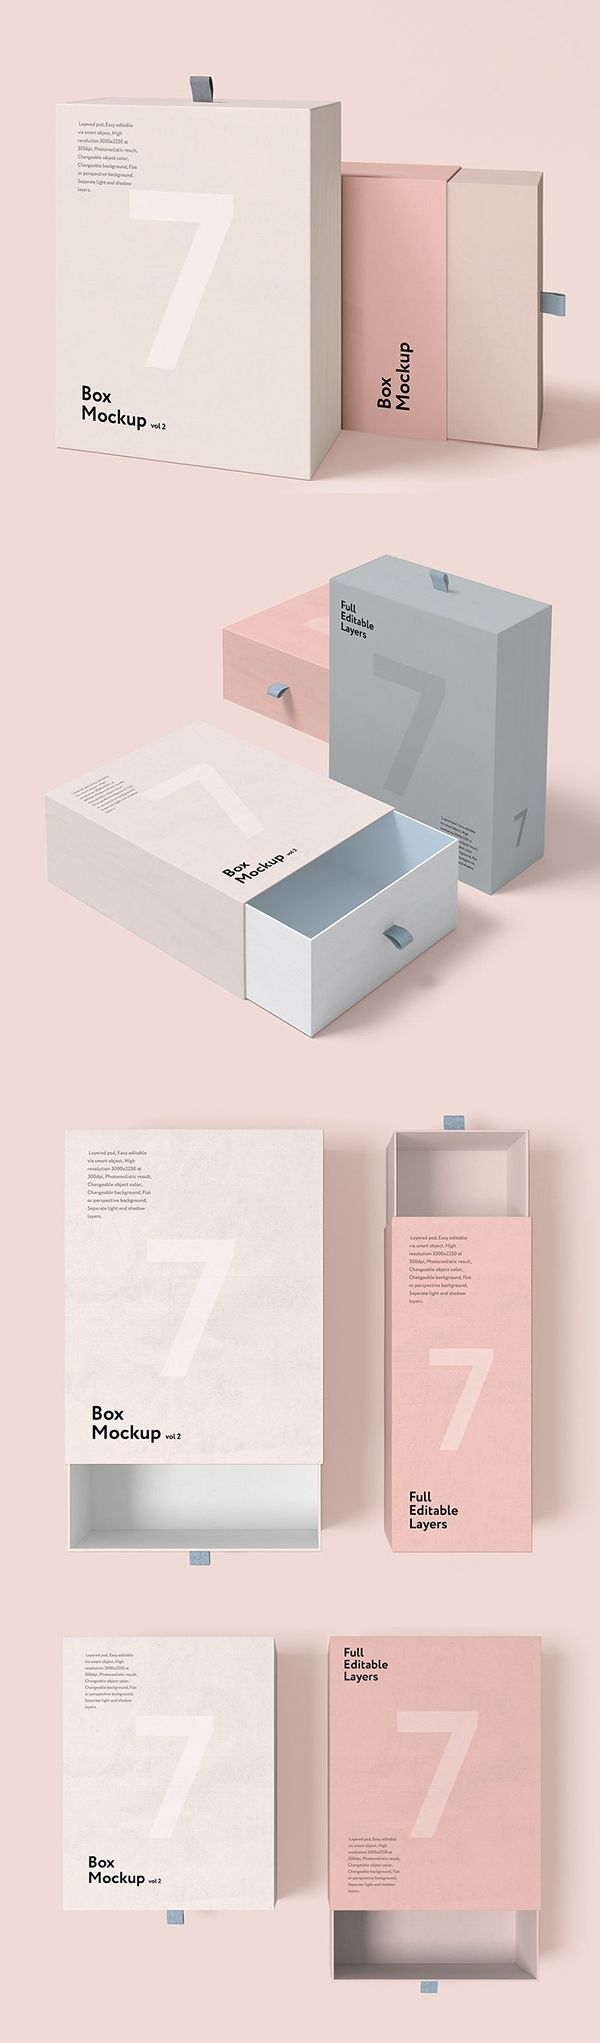 Download 32 Product Mockup Templates Download Realistic Psd Mockups Design Graphic Design Junction Box Packaging Design Creative Packaging Design Packaging Design Inspiration